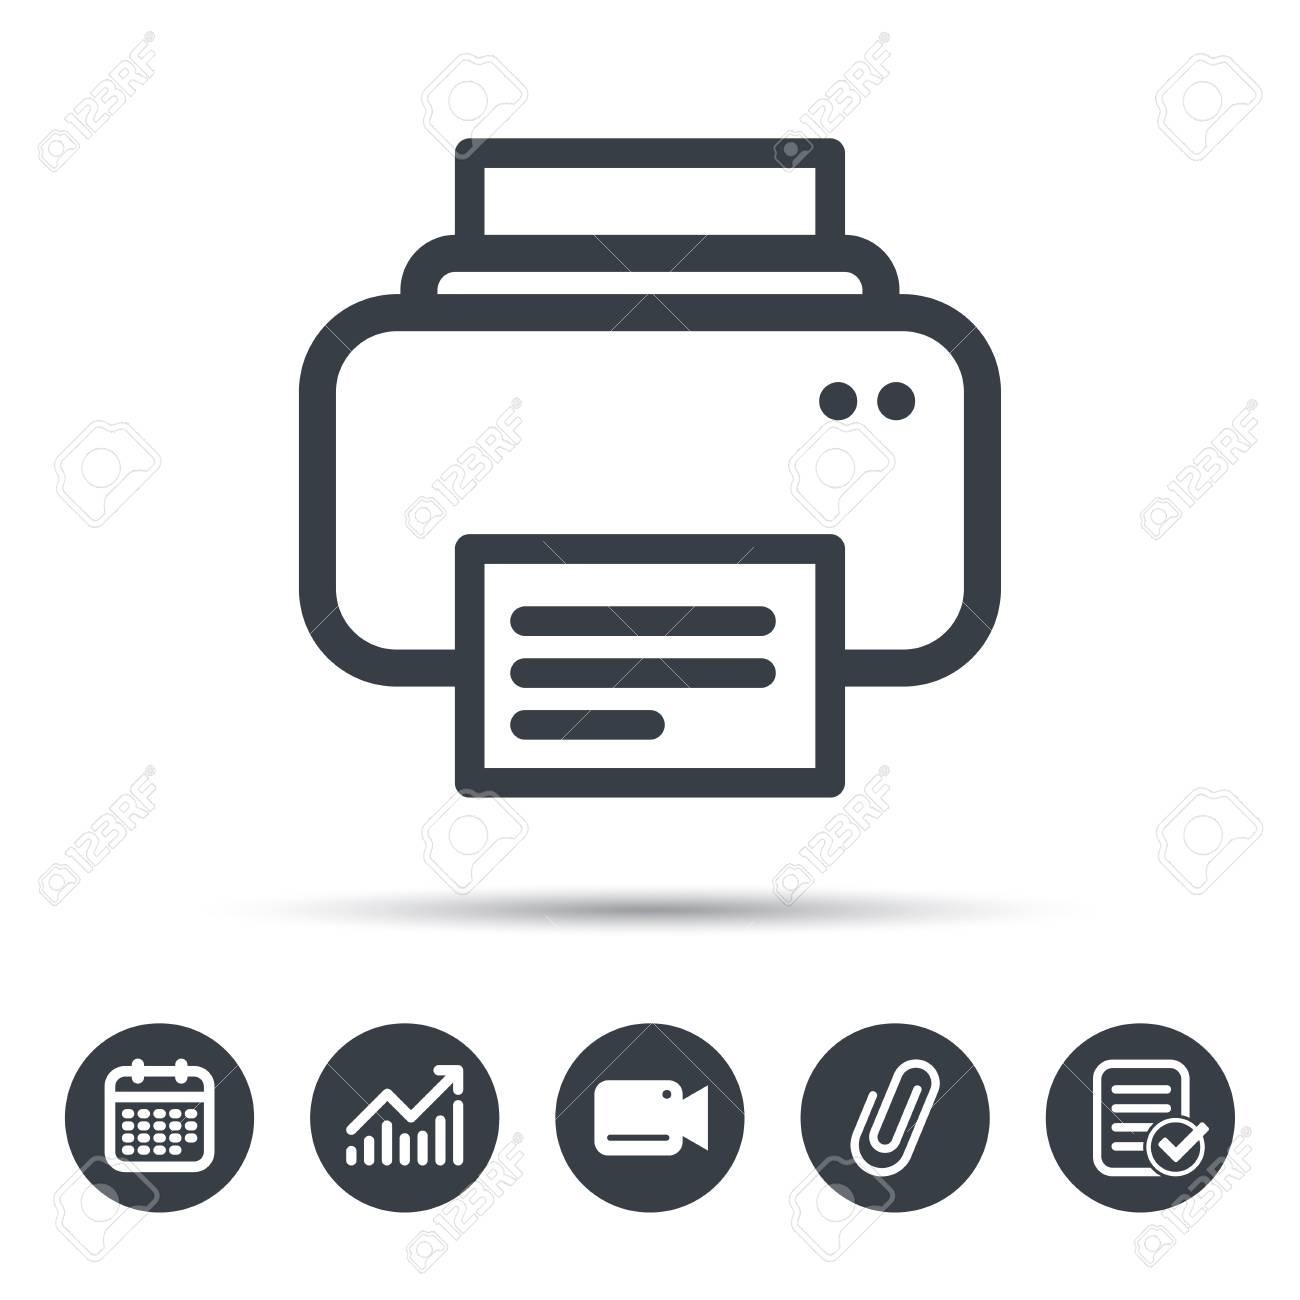 Printer Icon. Print Documents Technology Symbol. Calendar, Chart - Printable Video Surveillance Signs Free